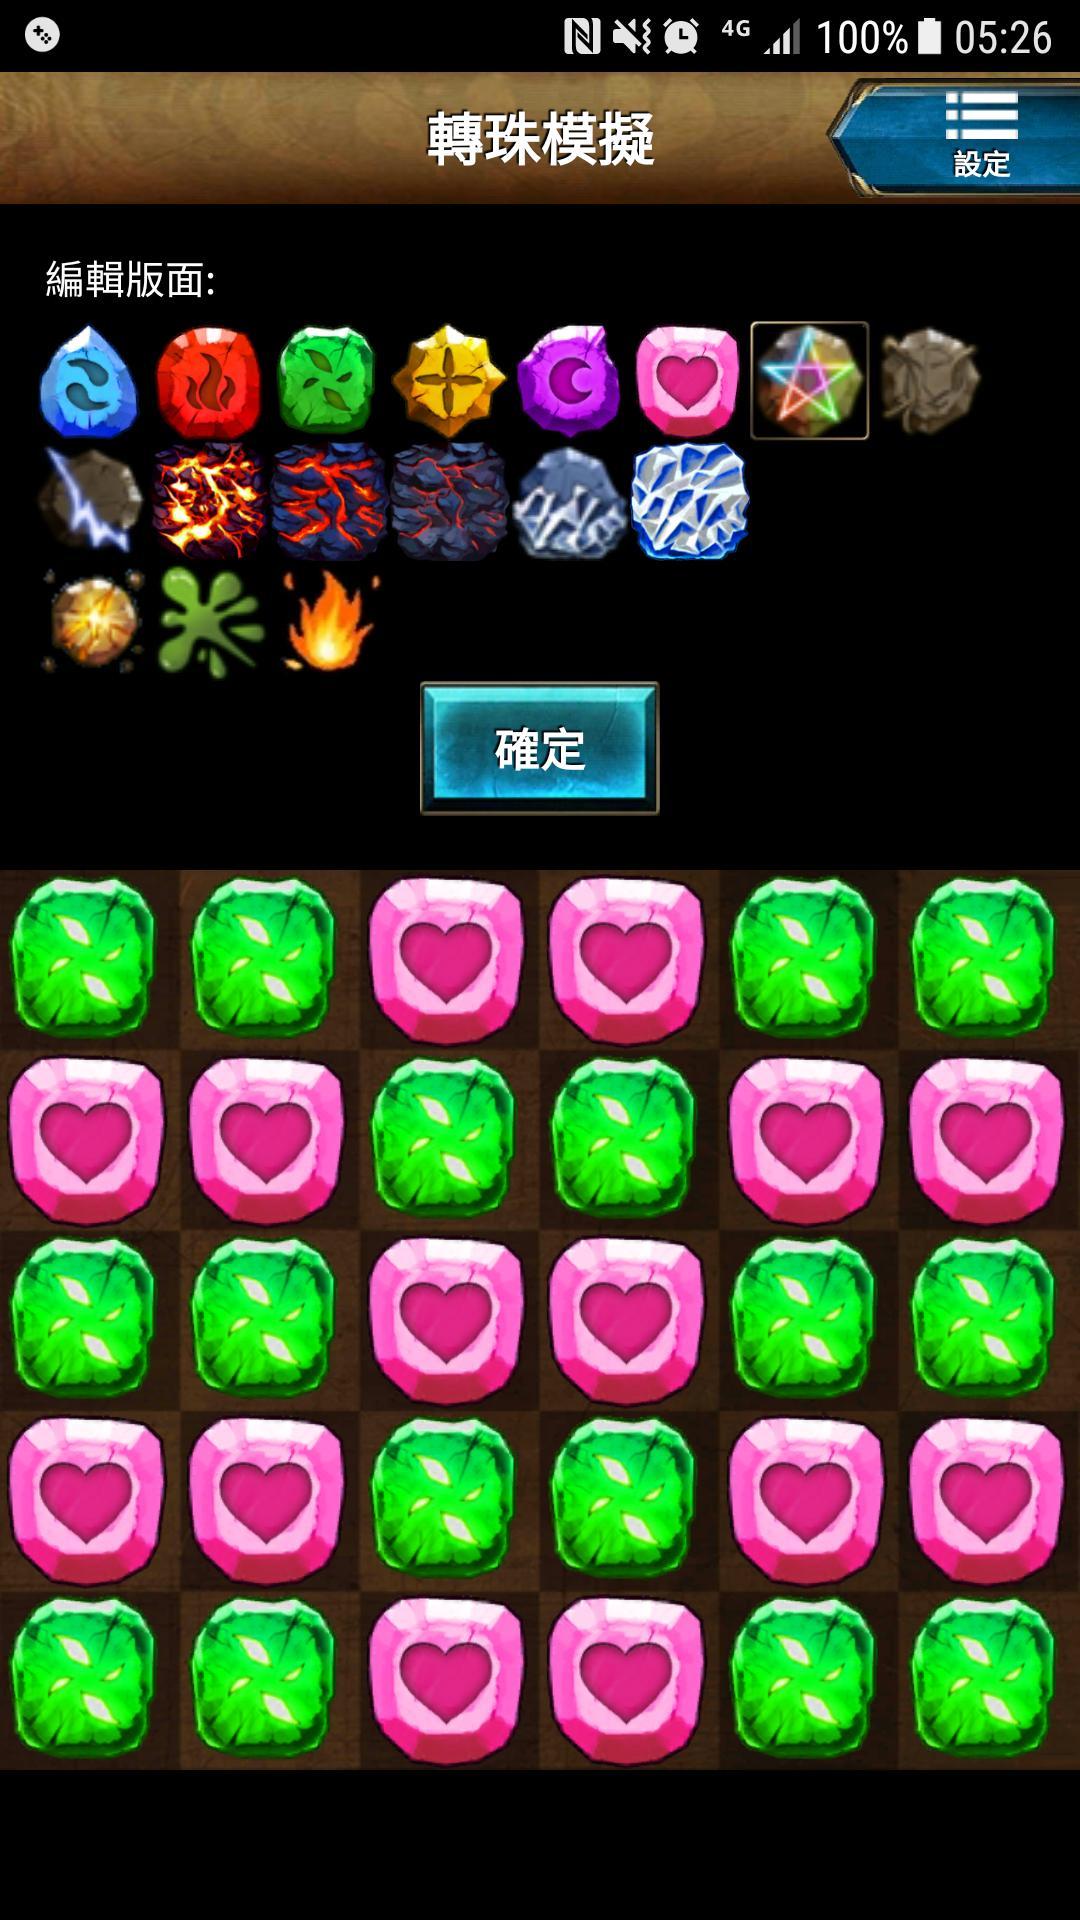 卡片圖鑑for神魔之塔 11.1.38 Screenshot 2